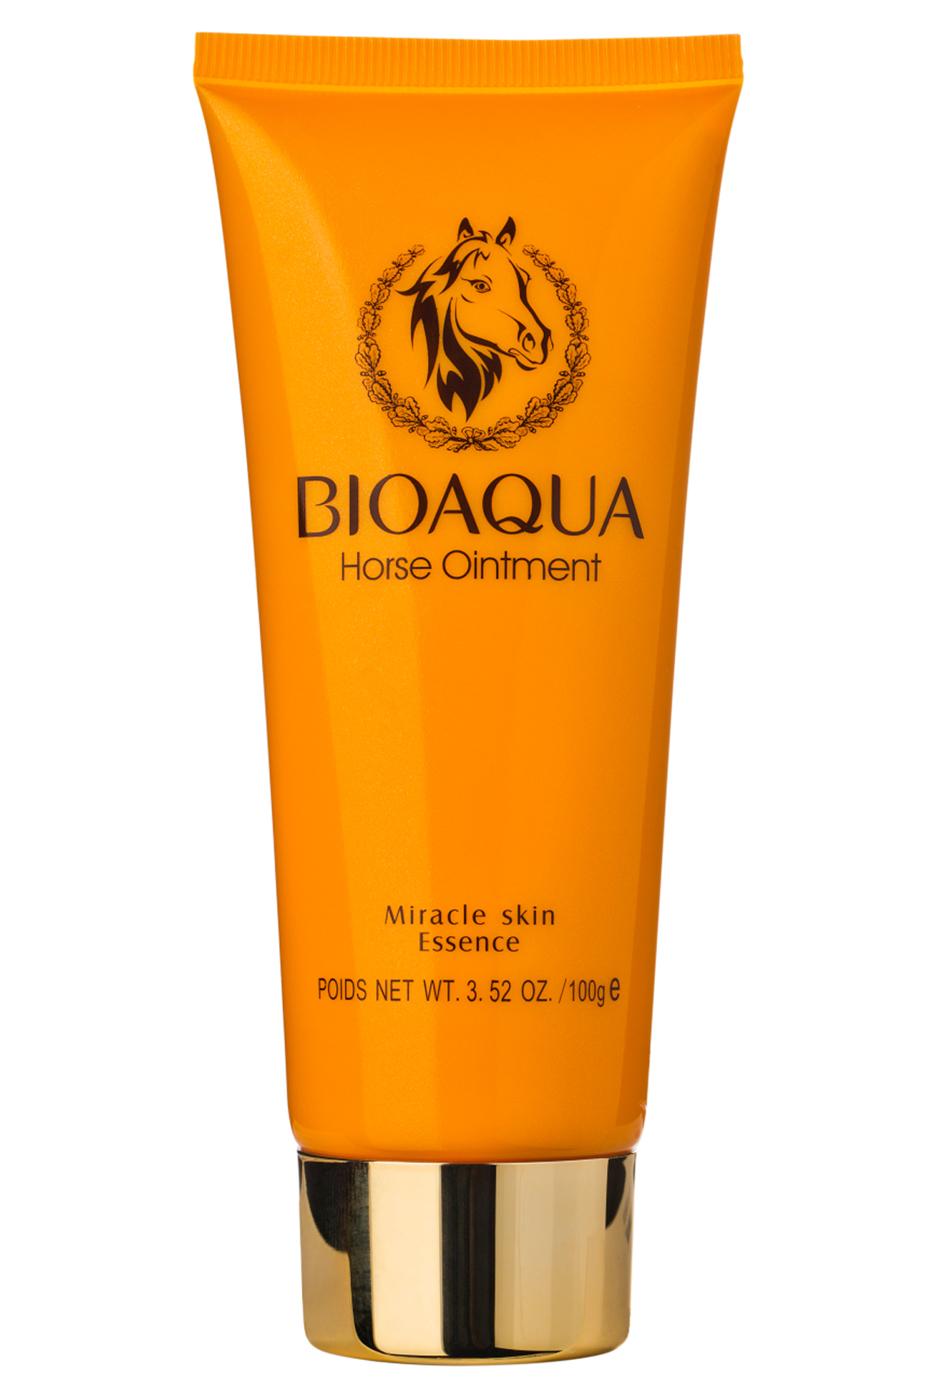 Bioaqua Пенка для умывания c лошадиным жиром Horse Ointment Cleanser, 100 гр